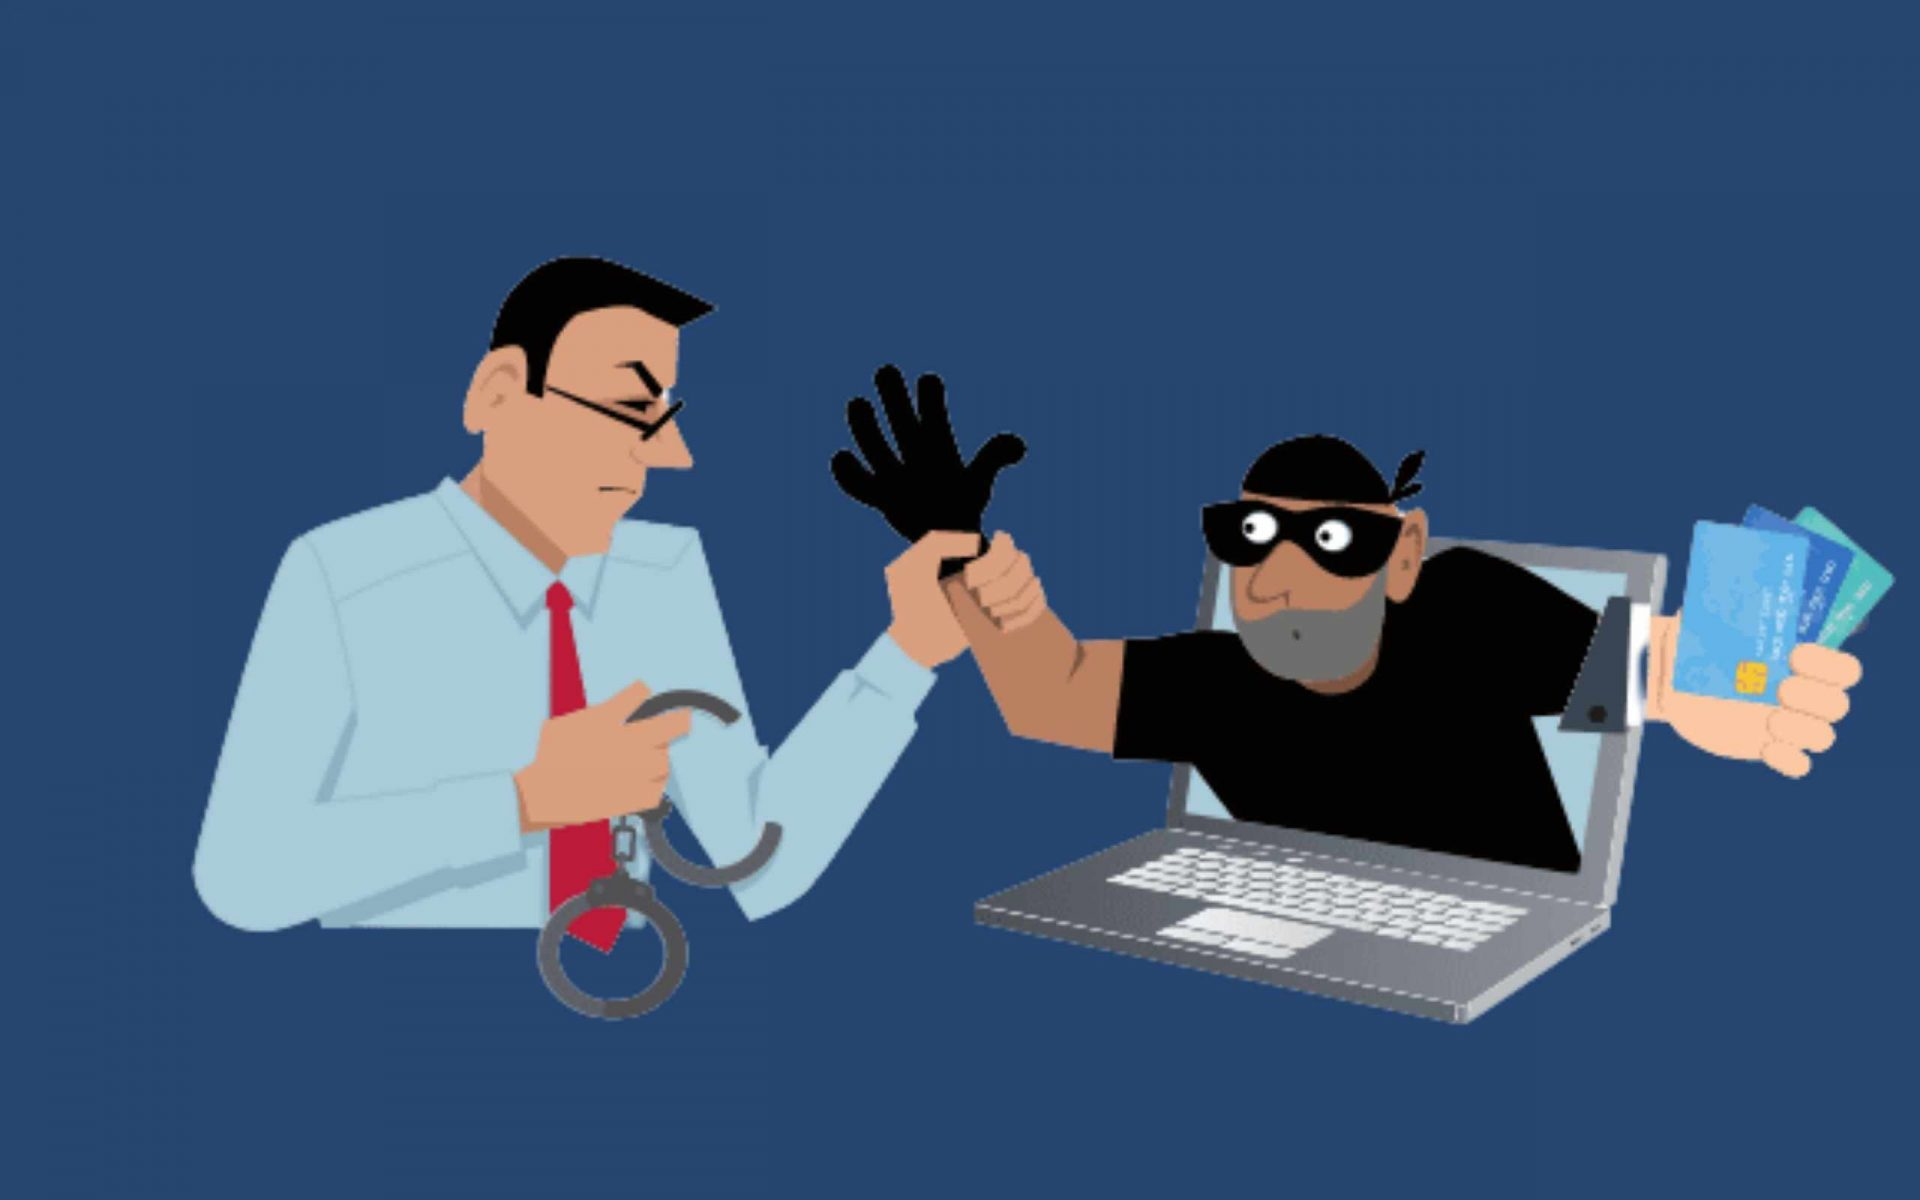 Handling Credit Card Frauds